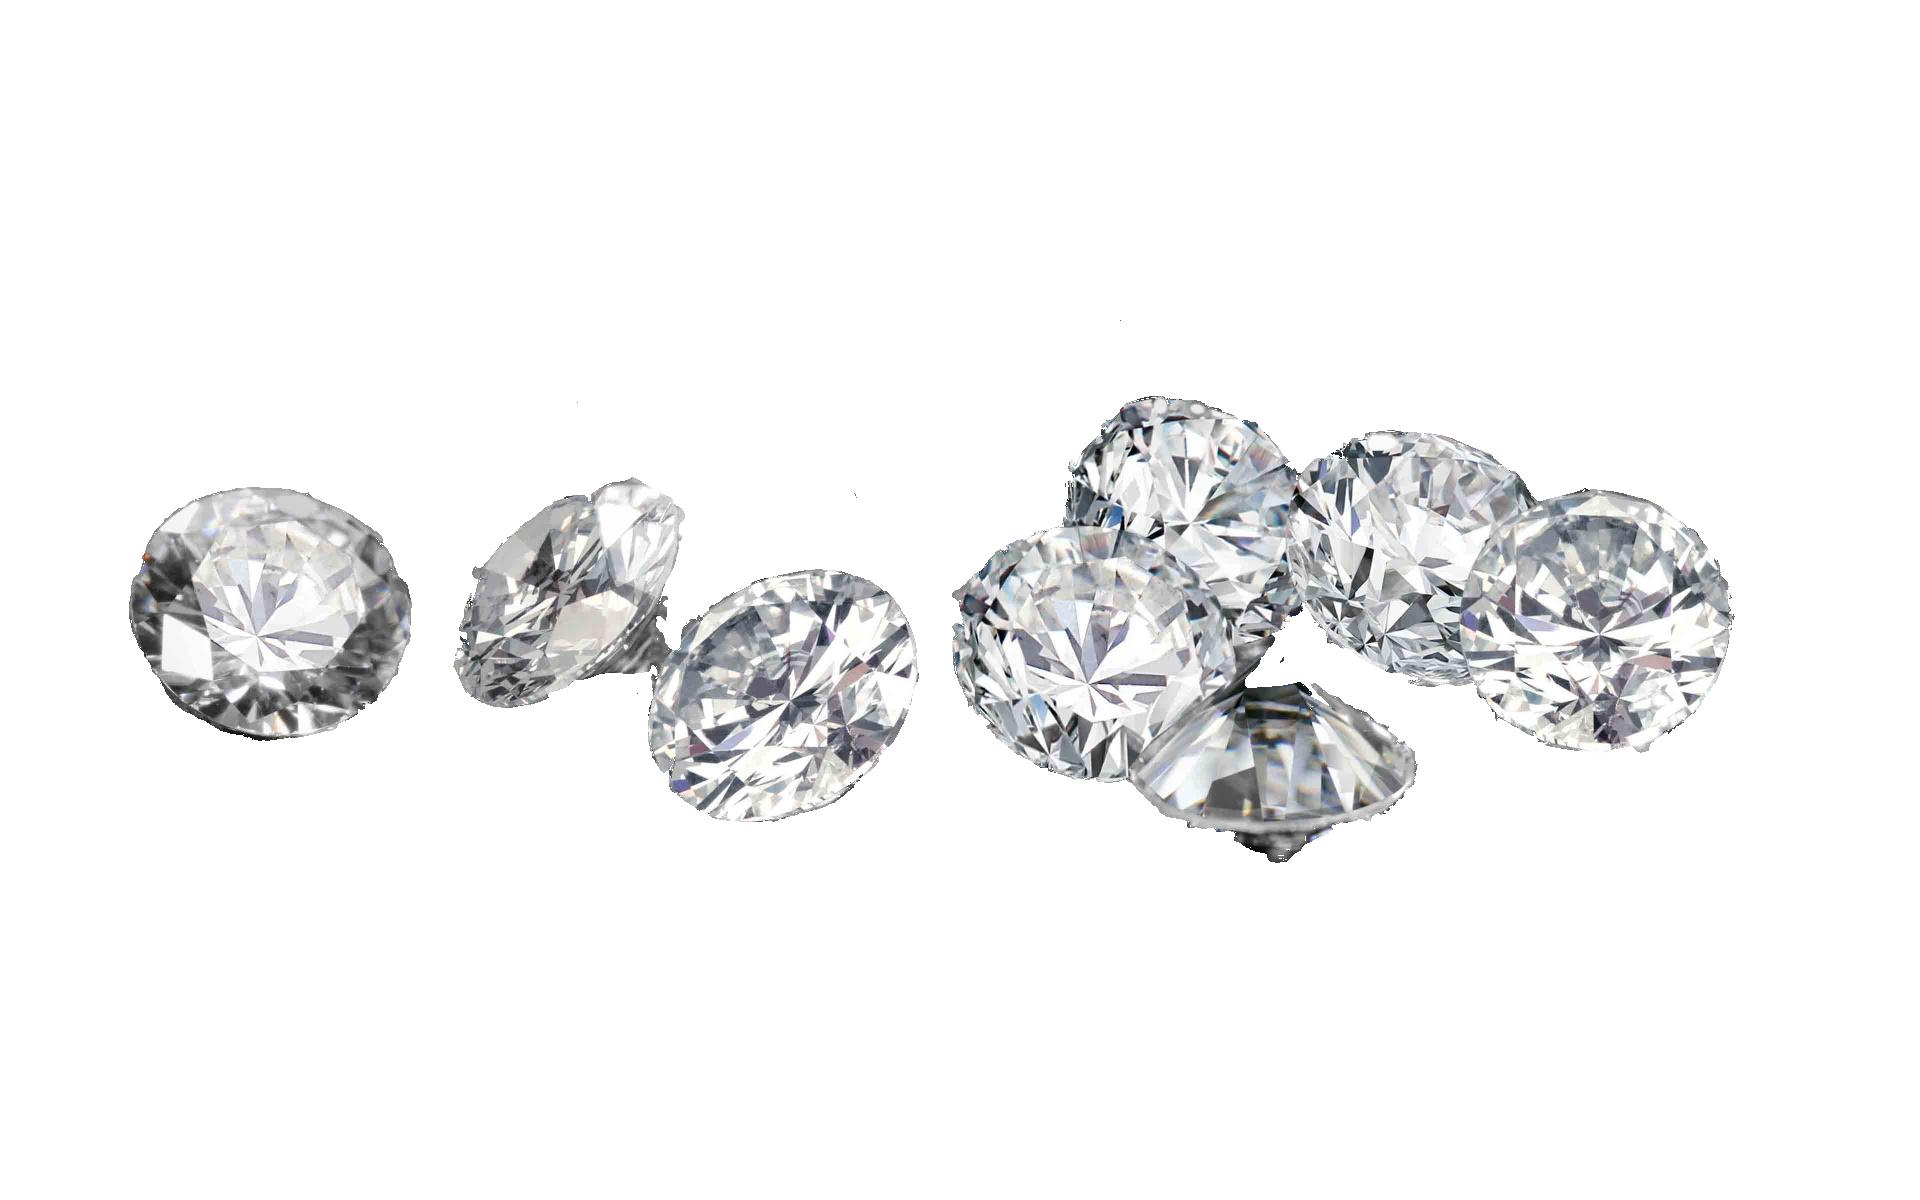 Diamond HD PNG - 120191